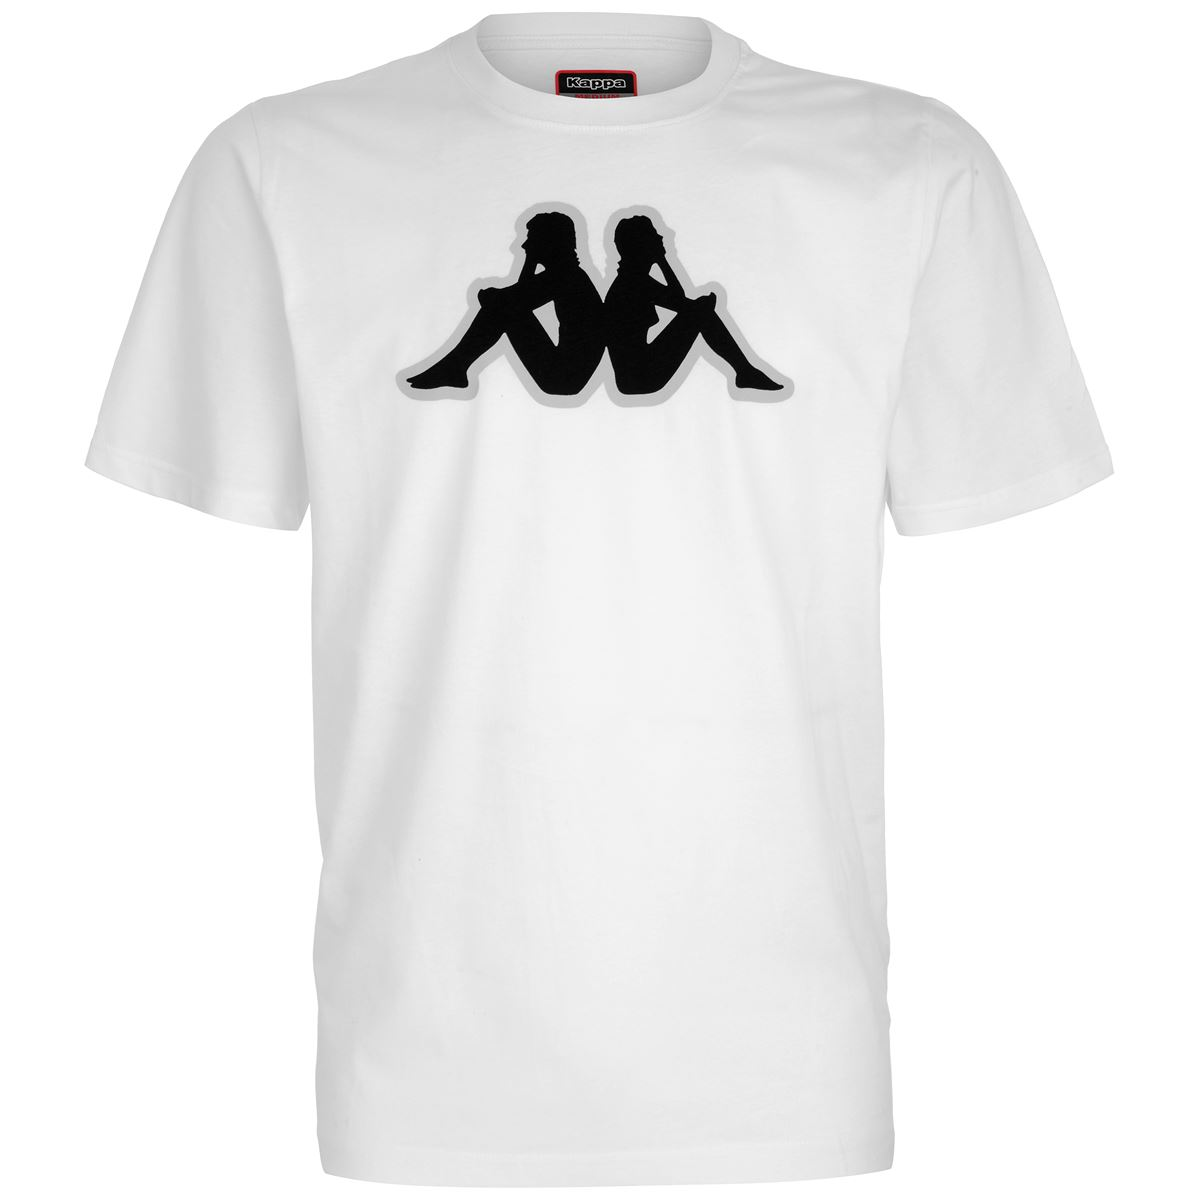 T-SHIRT KAPPA KAPPA | T-shirt m/m | 303WEK0904